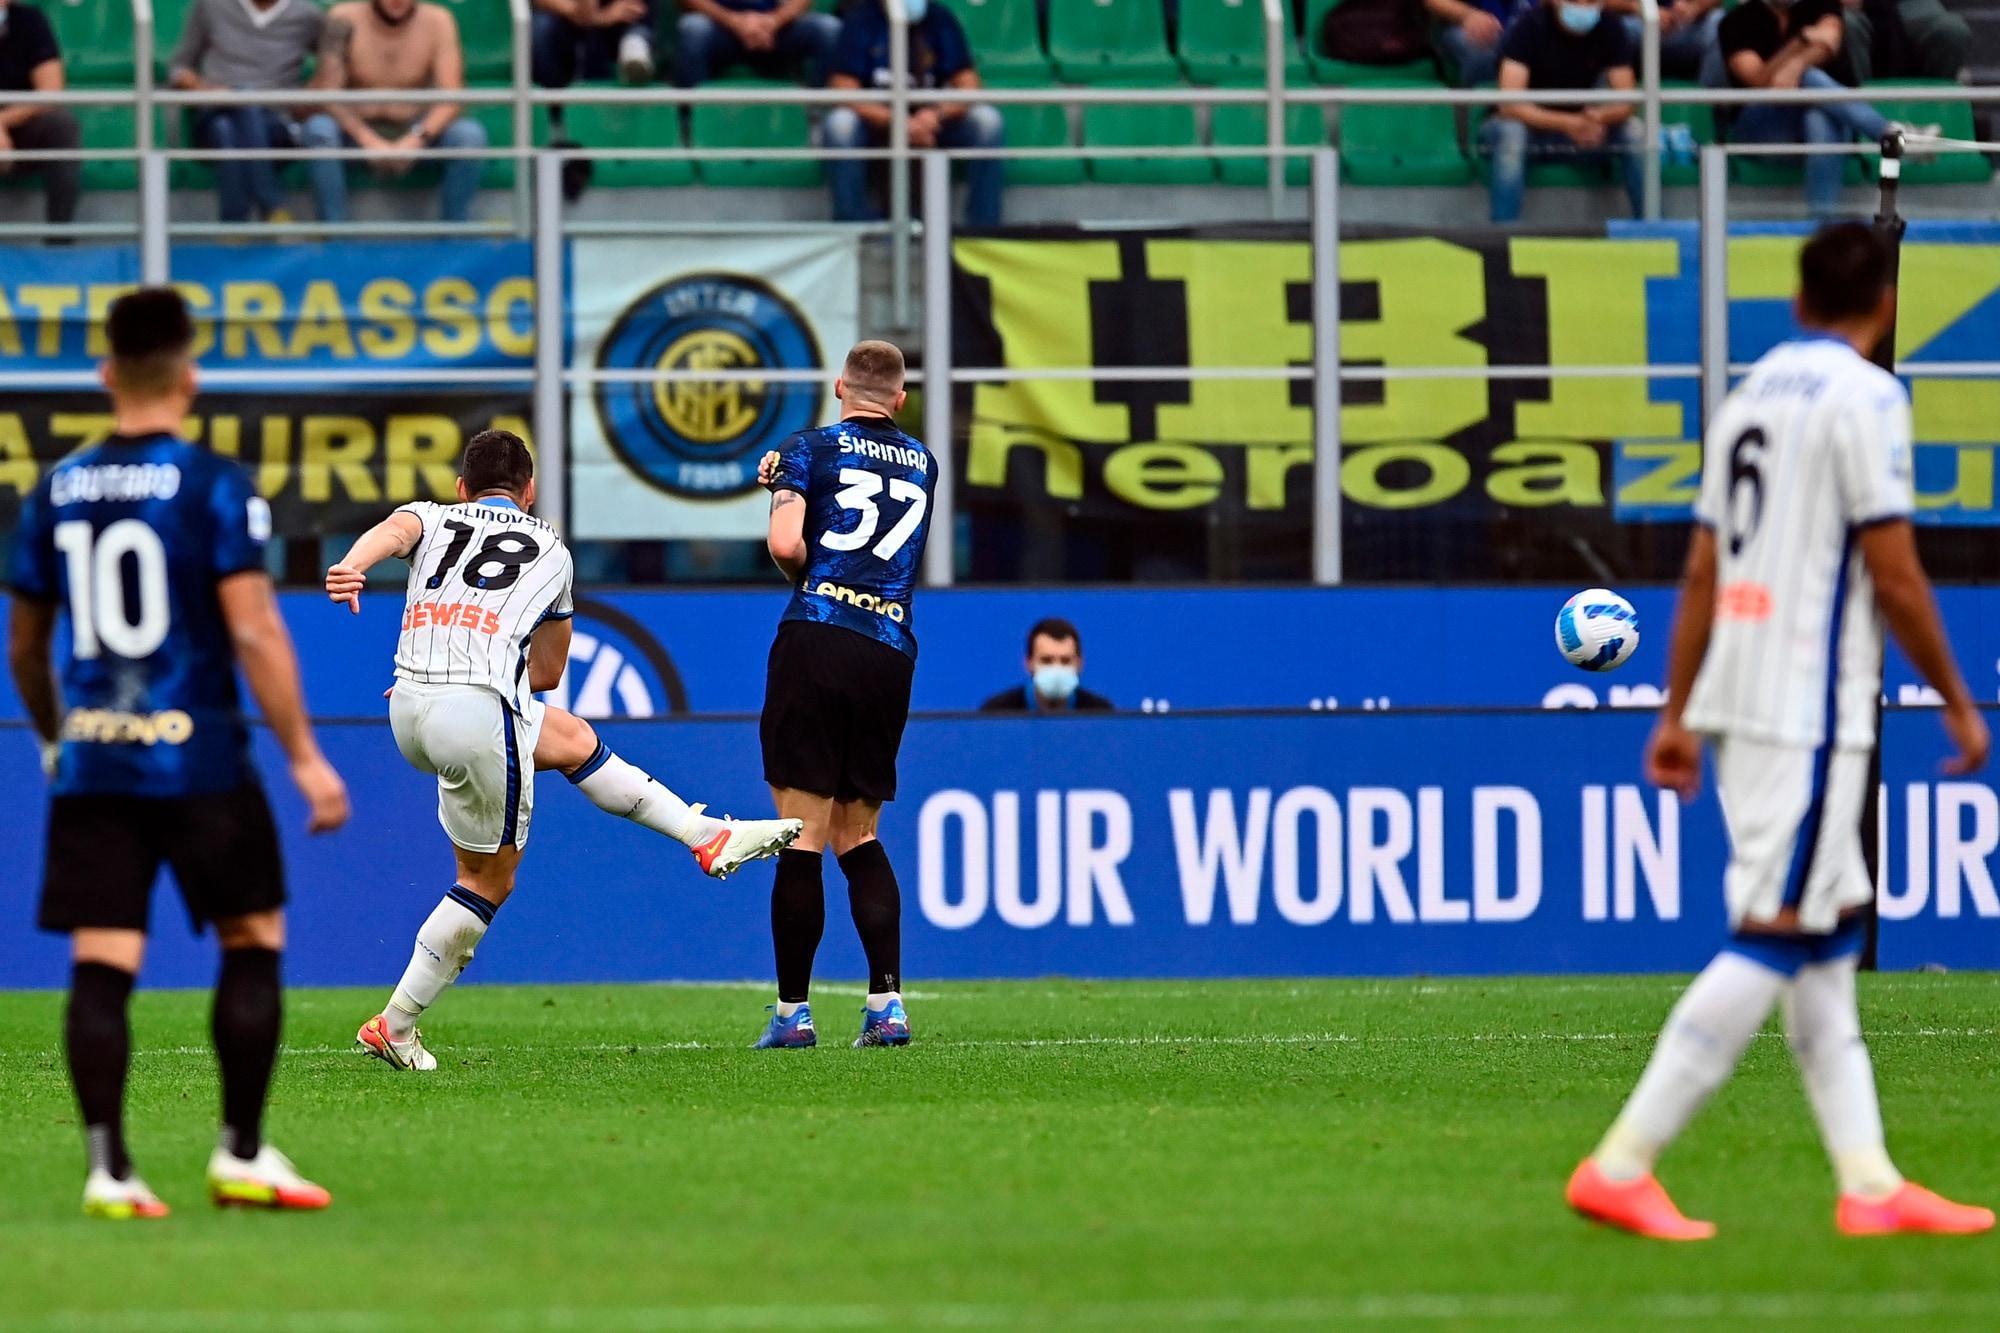 Che show tra Inter e Atalanta: Malinovskyi e Lautaro, gol d'autore